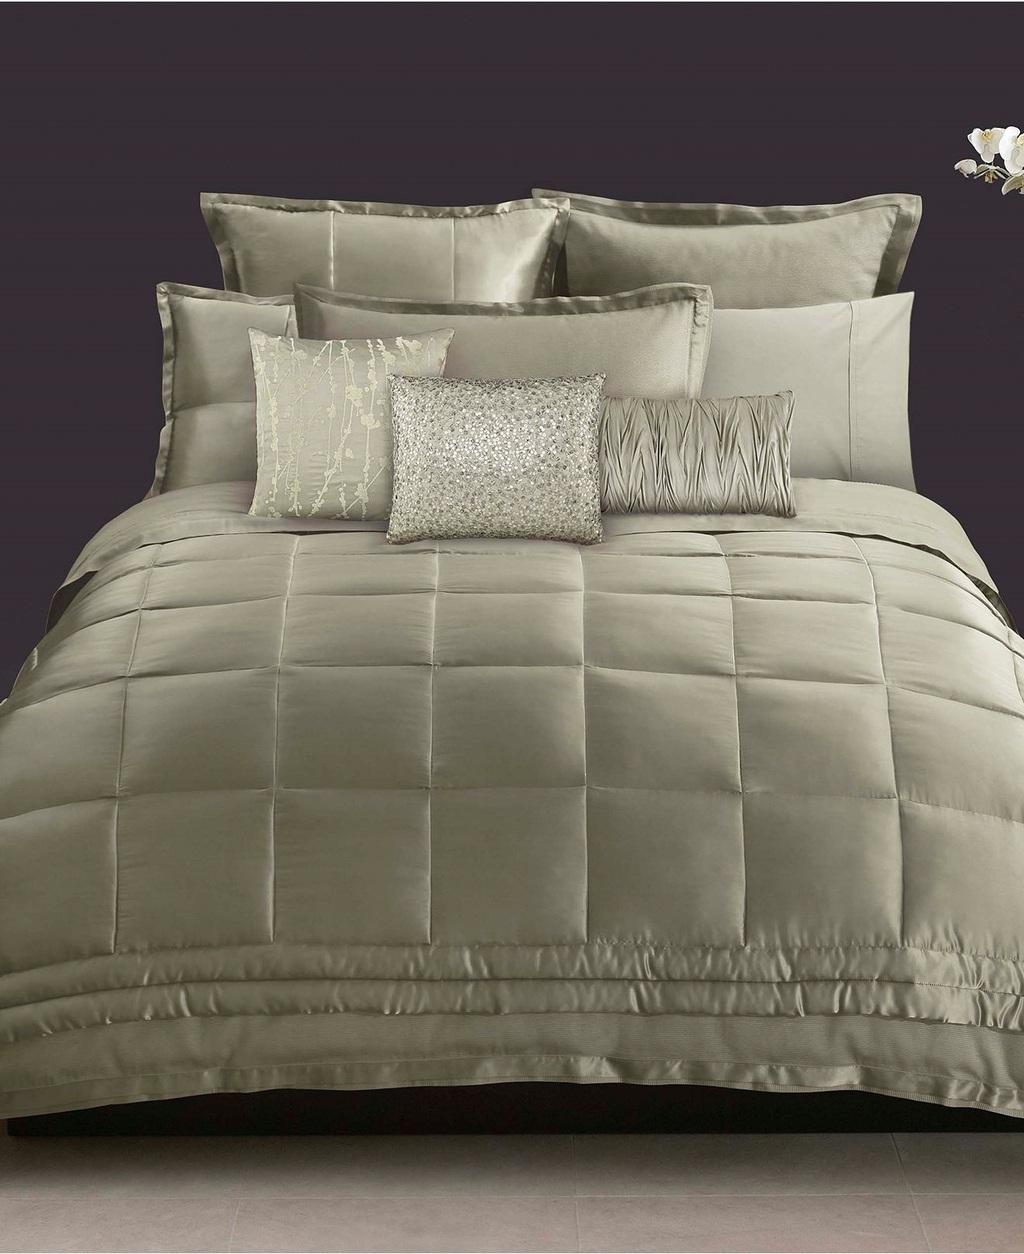 donna karan modern classics silk king quilt celadon ebay. Black Bedroom Furniture Sets. Home Design Ideas